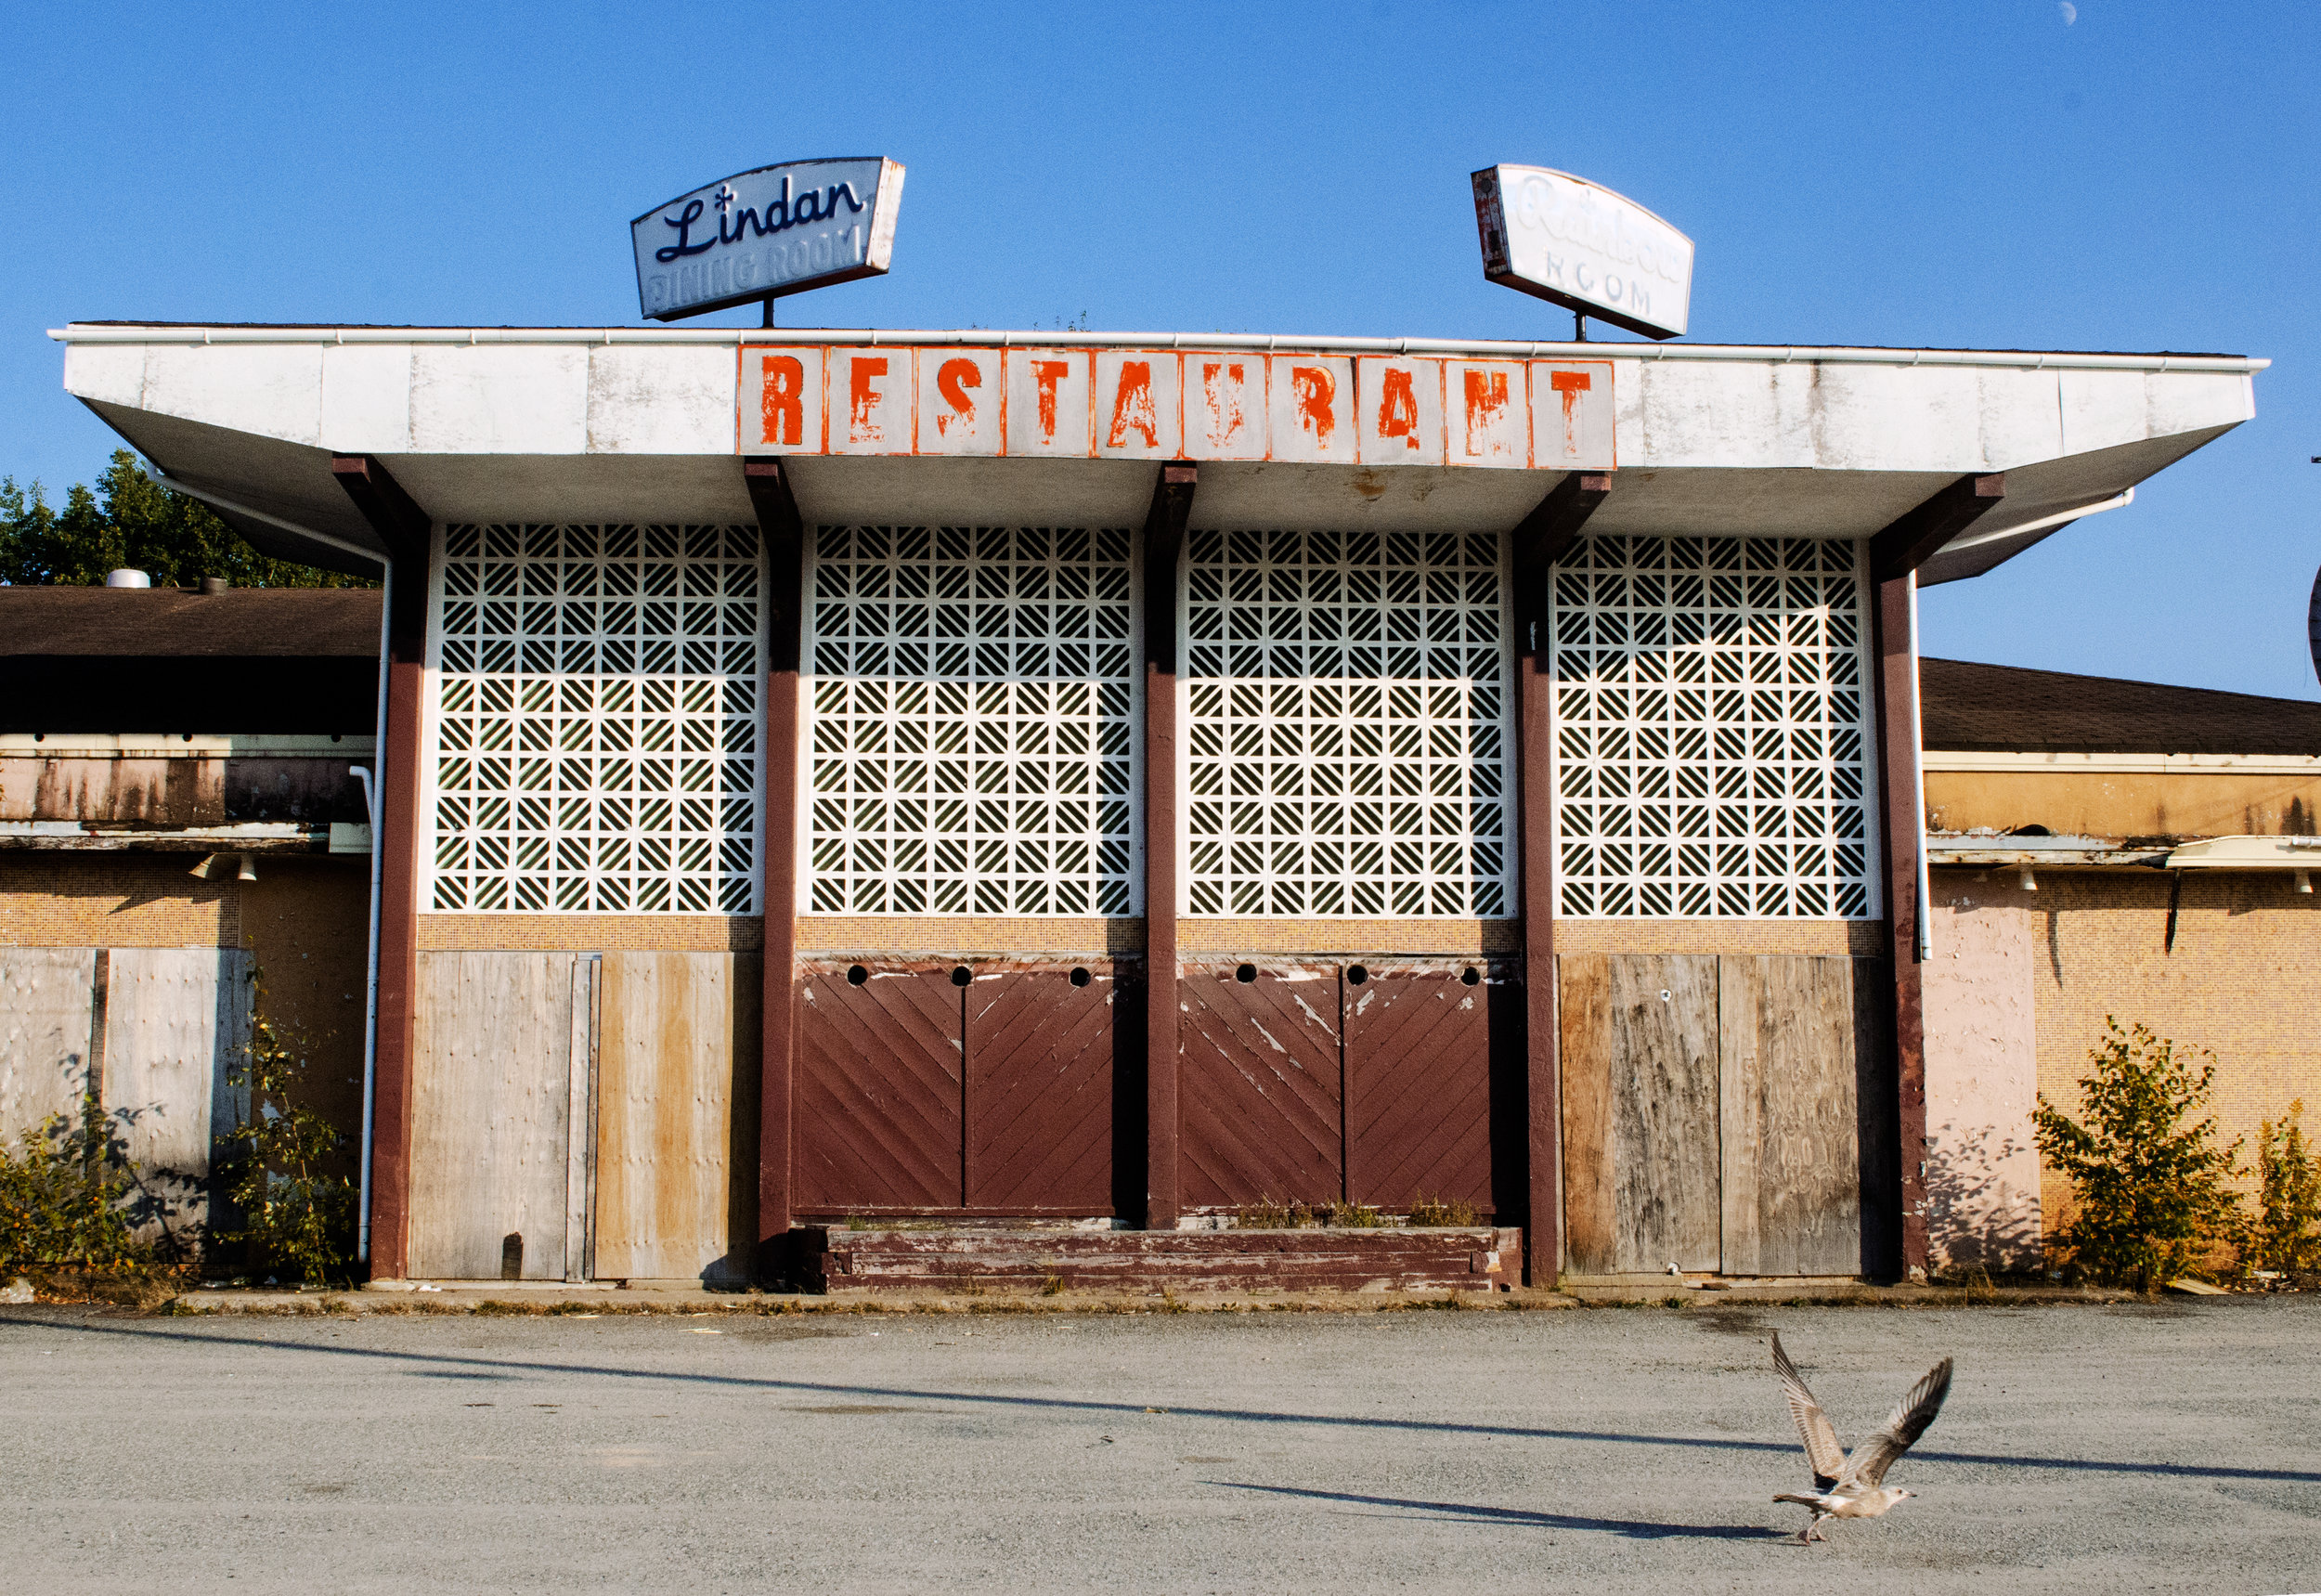 Jenkins, Cheyenne. Blue Bird Inn. 2017. Digital Photography. Wawa, Ontario